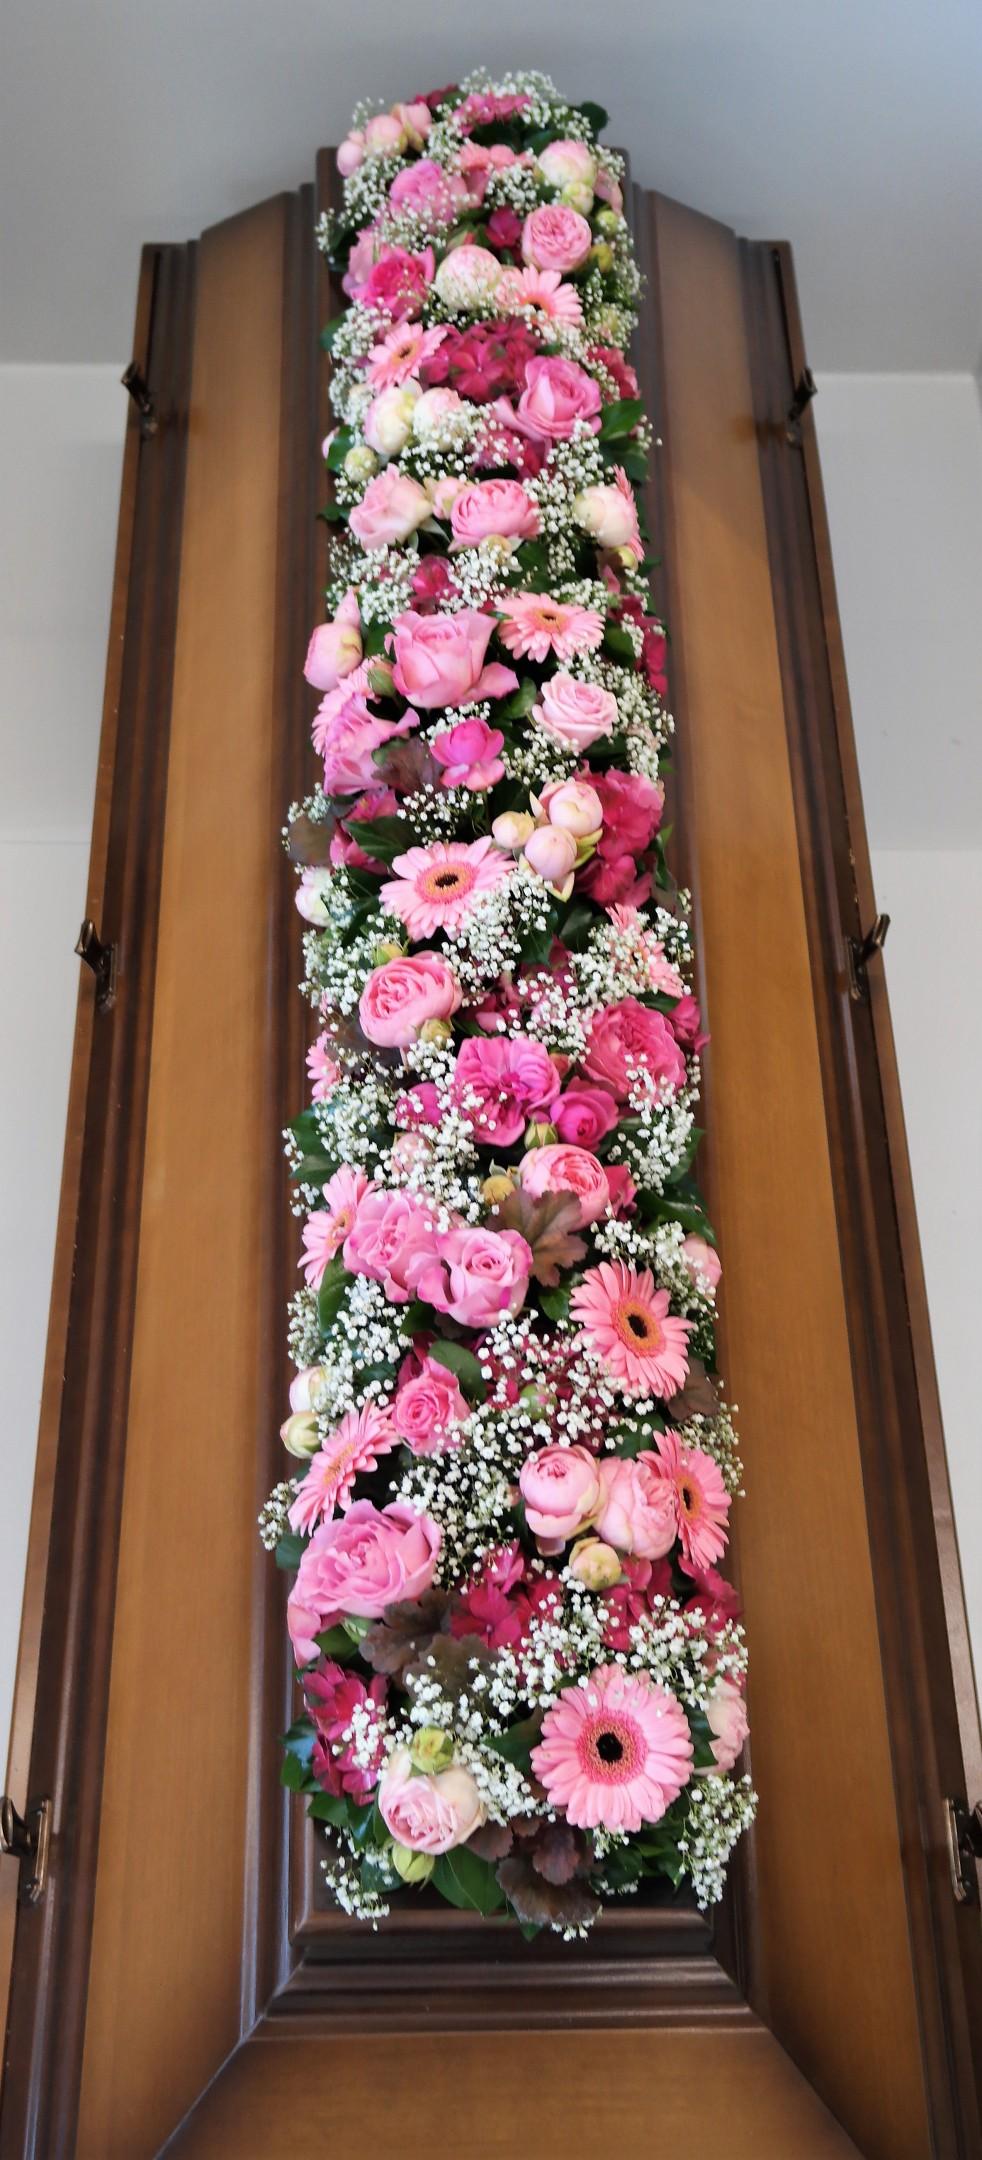 Rosa Linie Bild 2